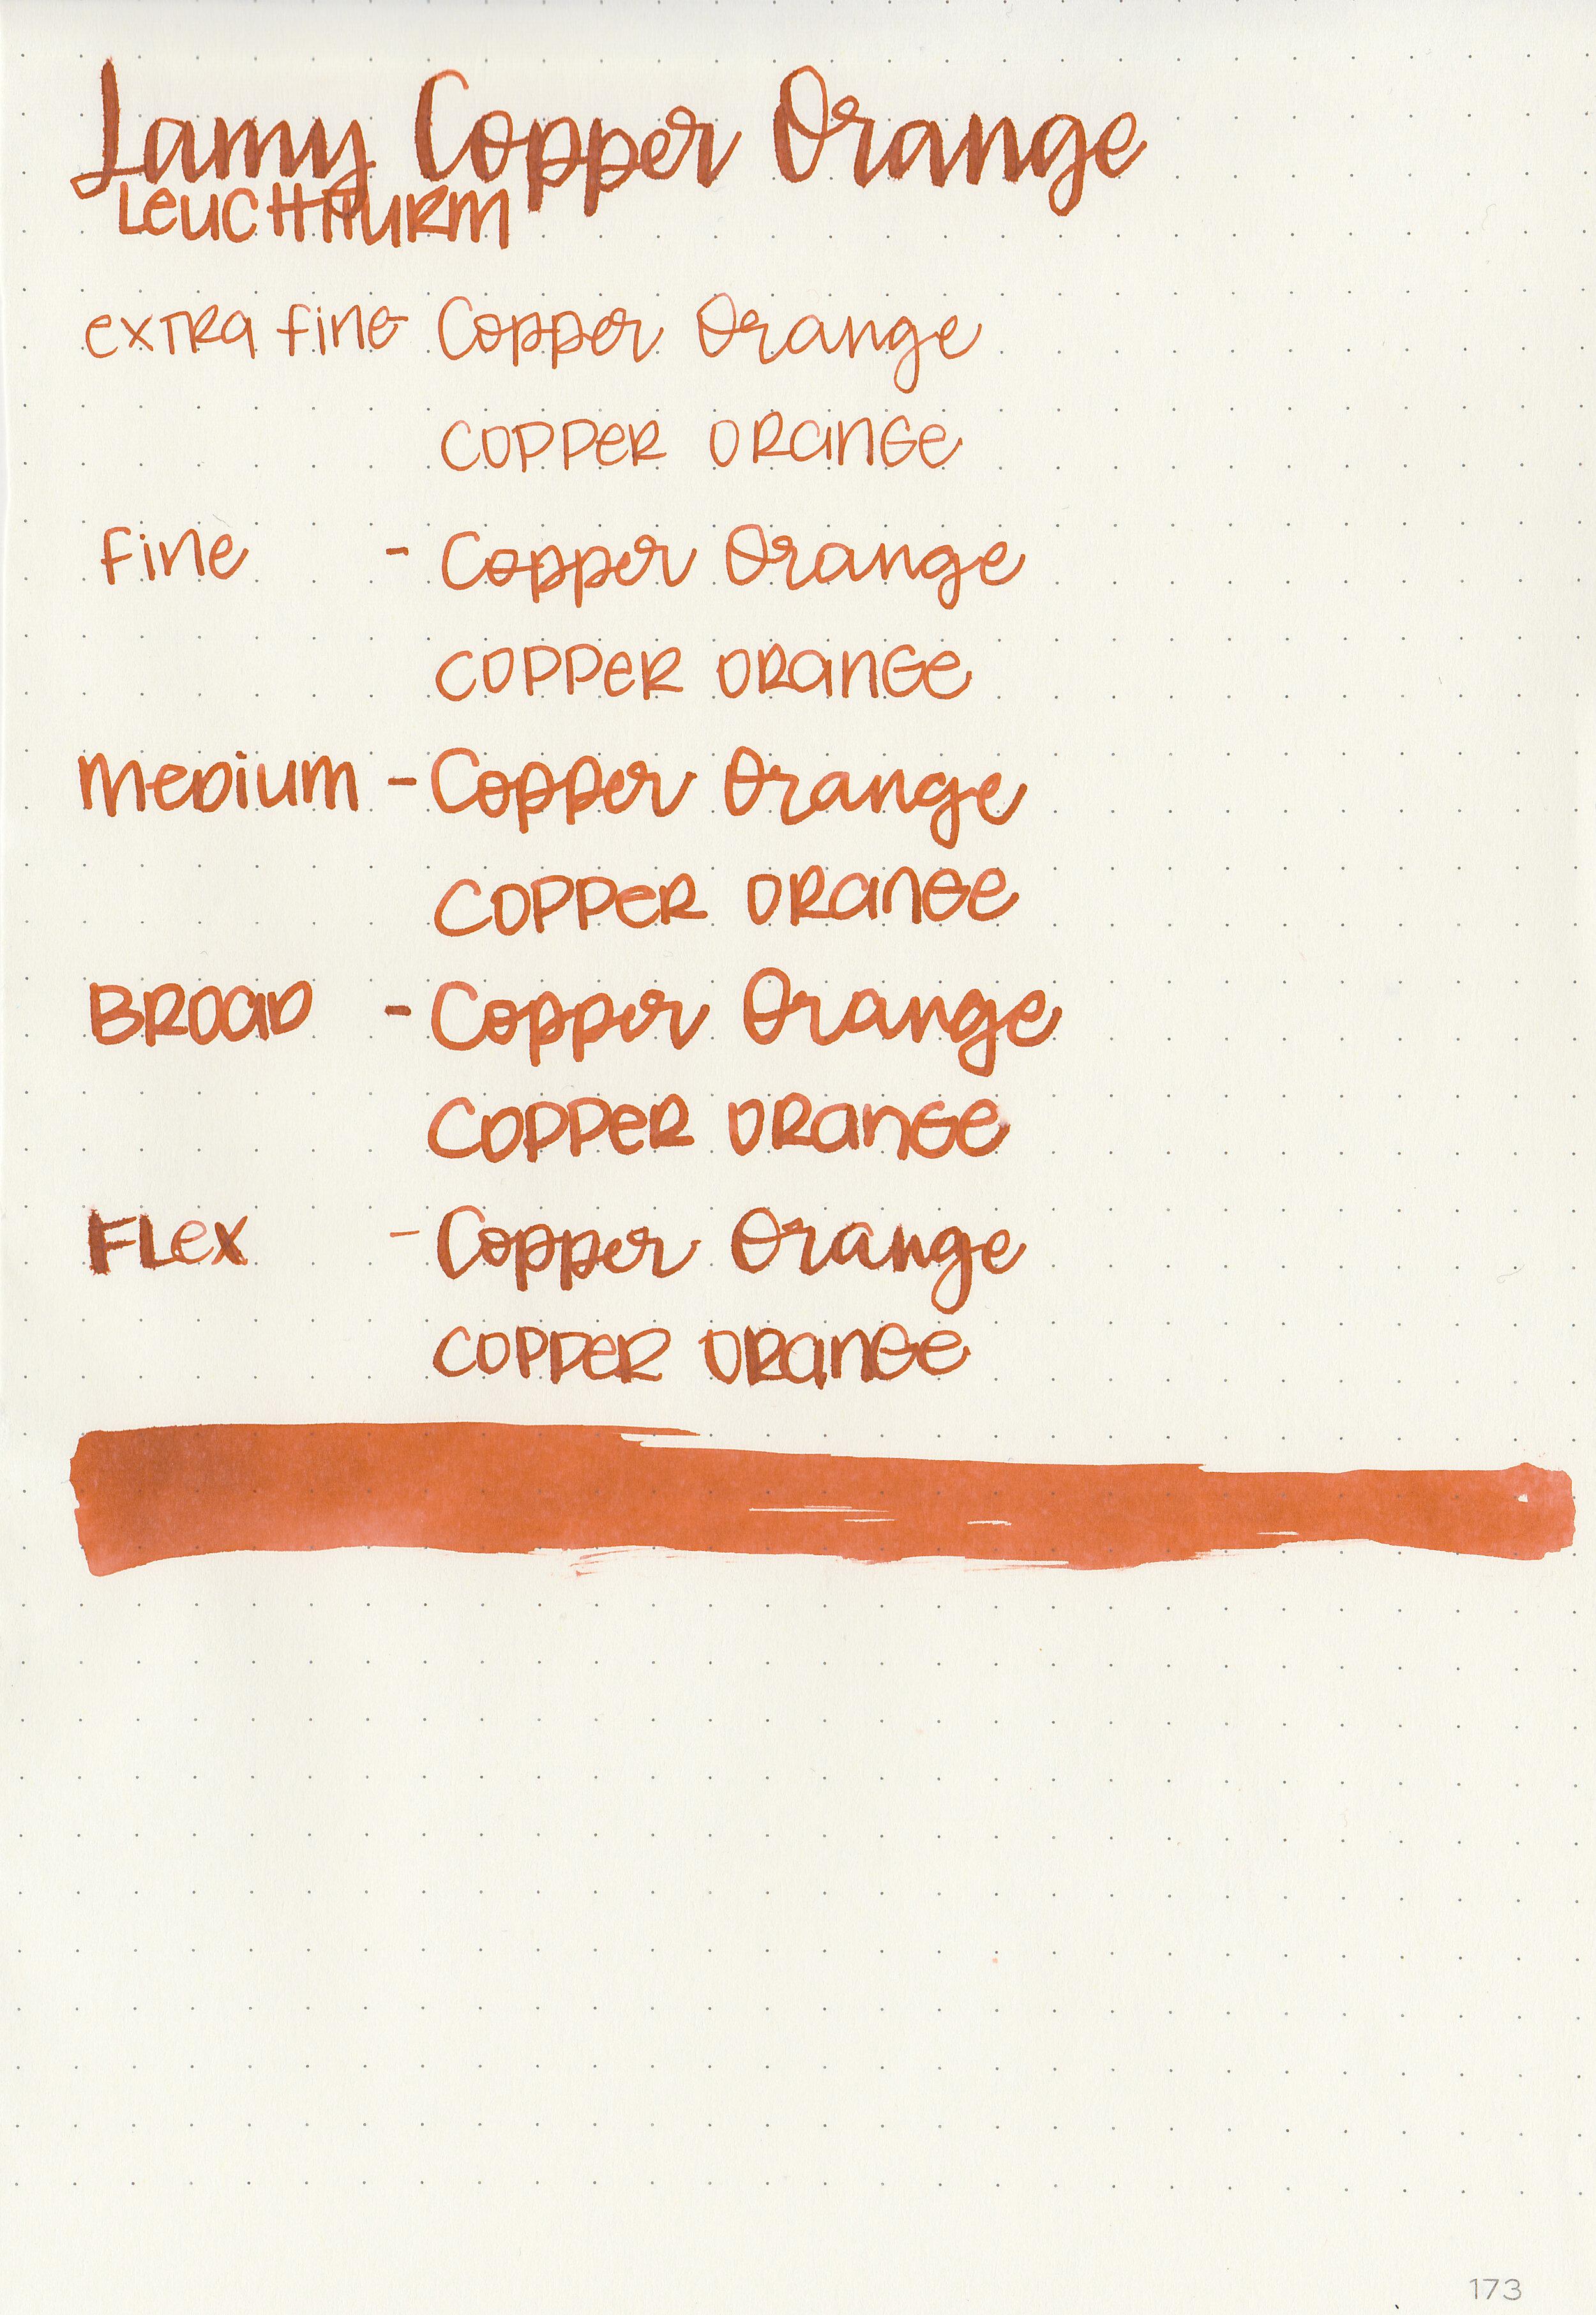 lmy-copper-orange-9.jpg